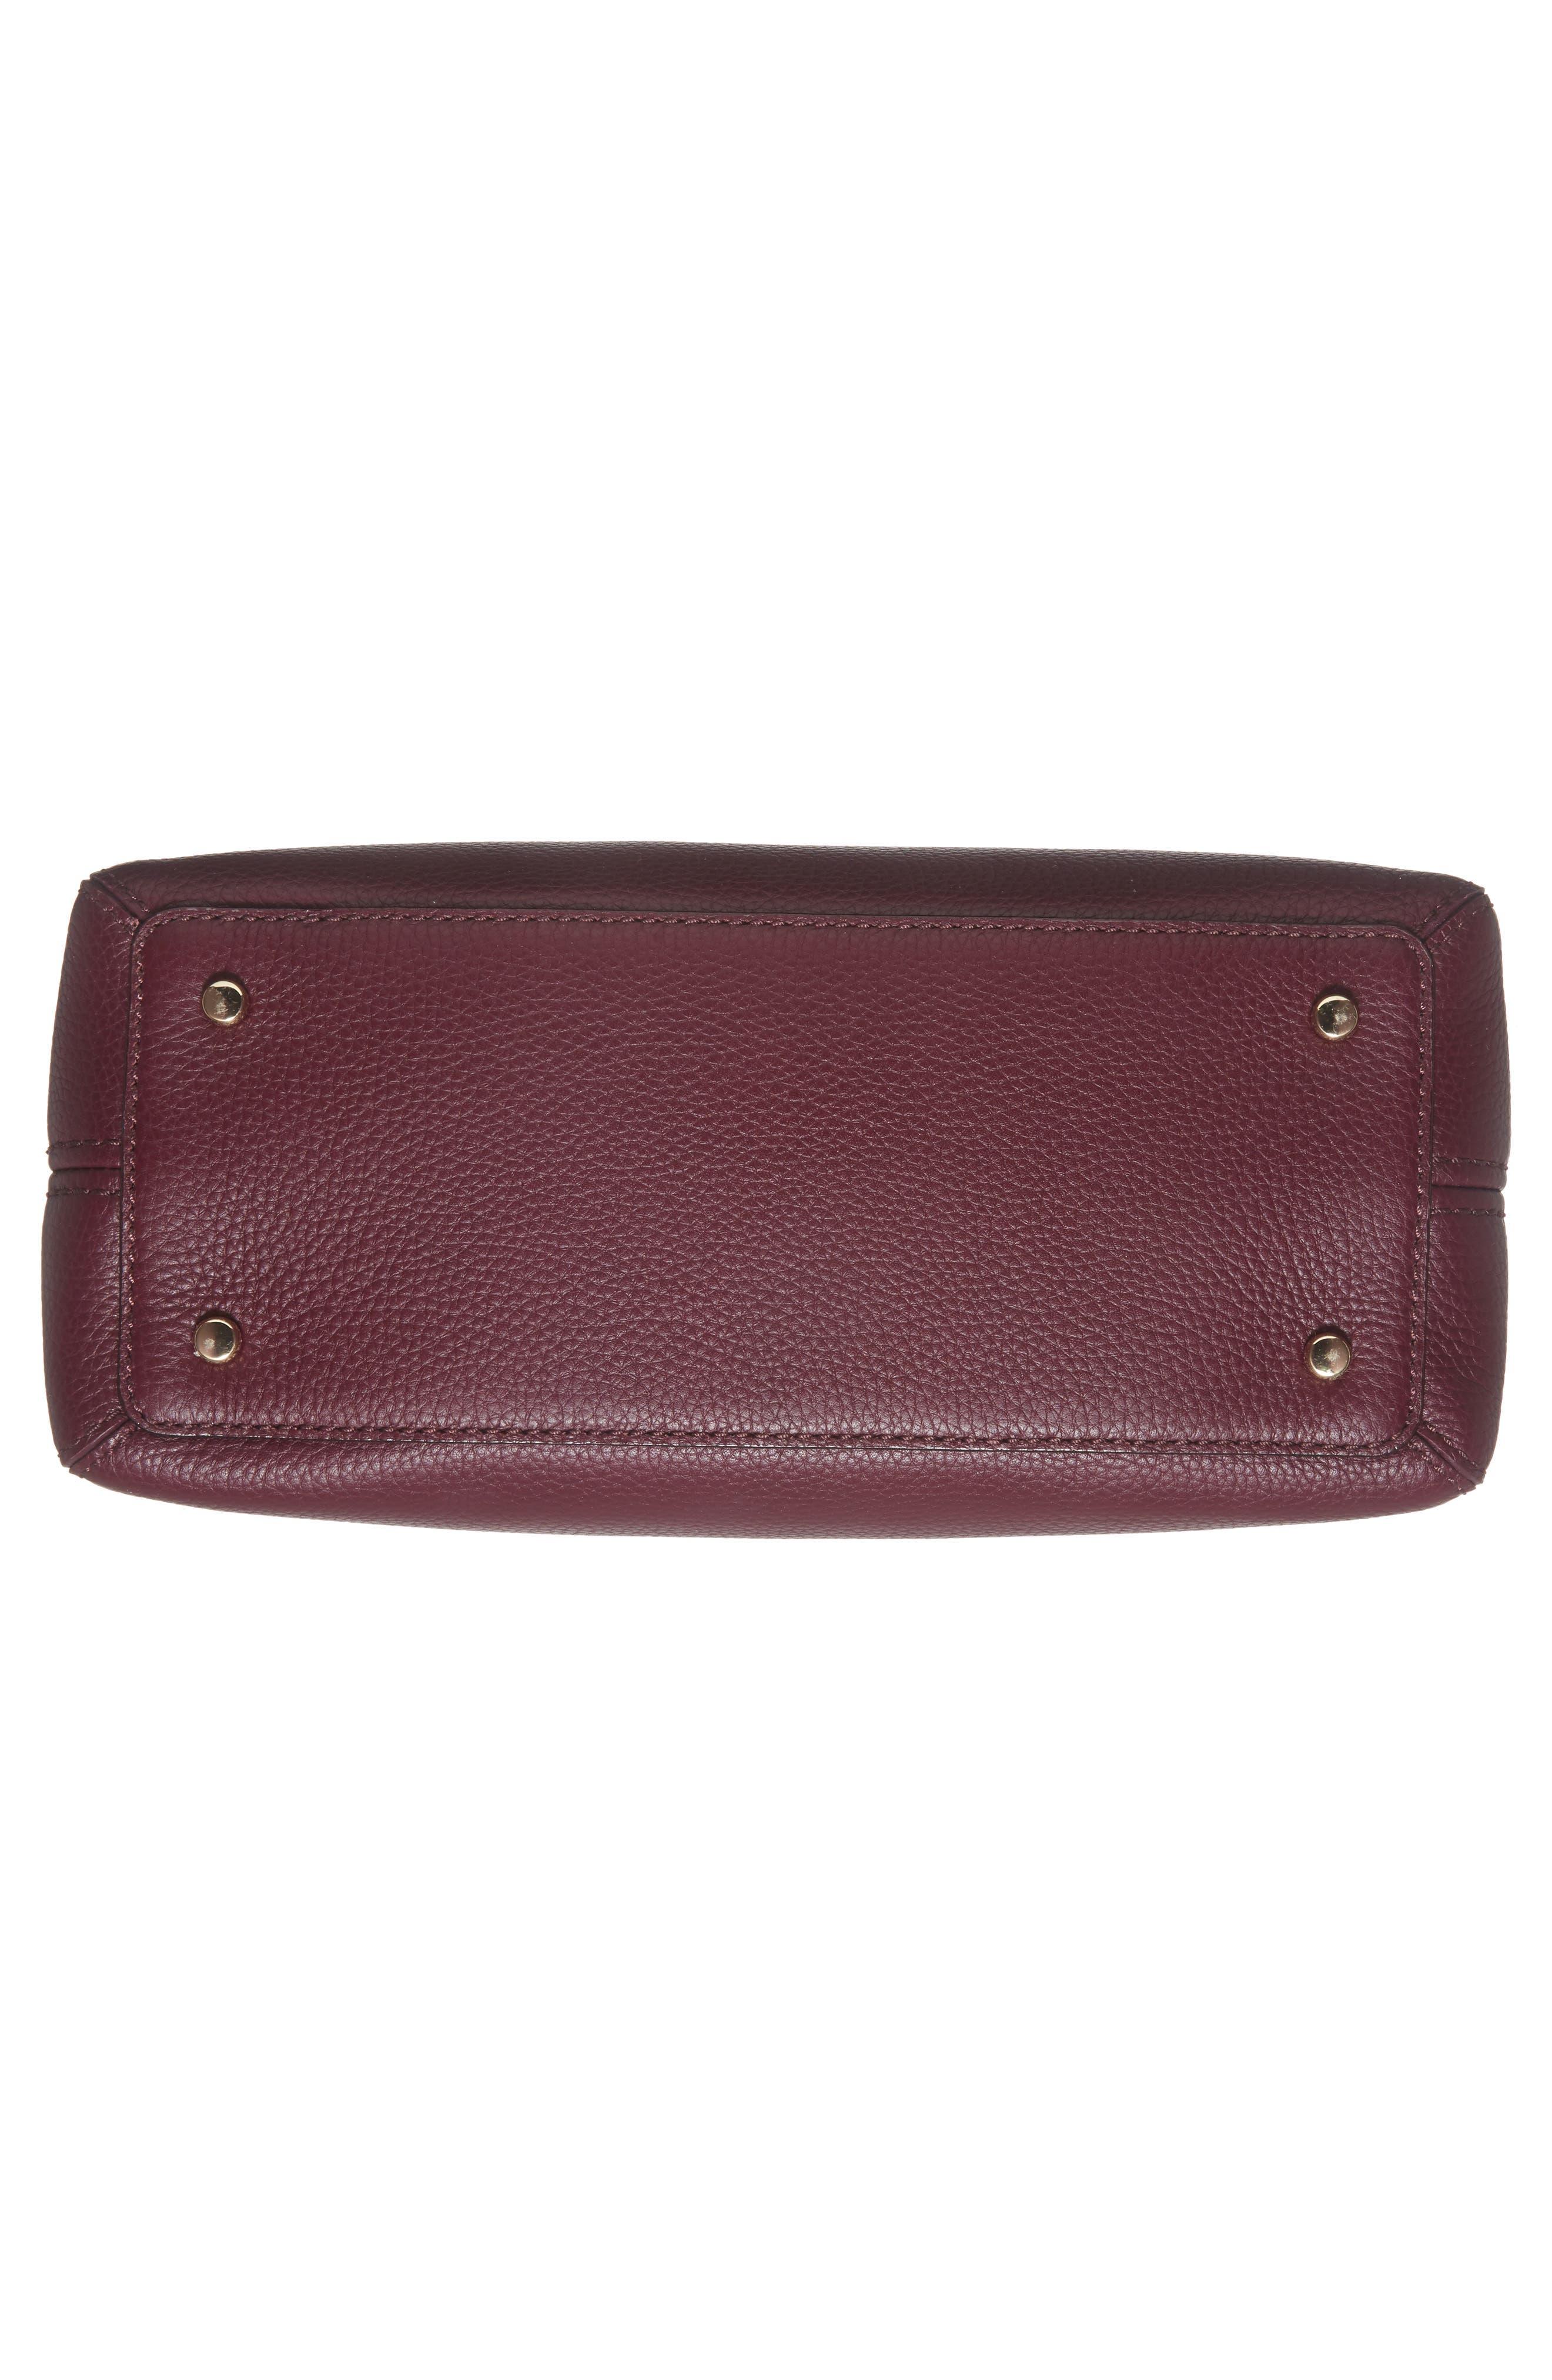 jackson street lottie leather satchel,                             Alternate thumbnail 18, color,